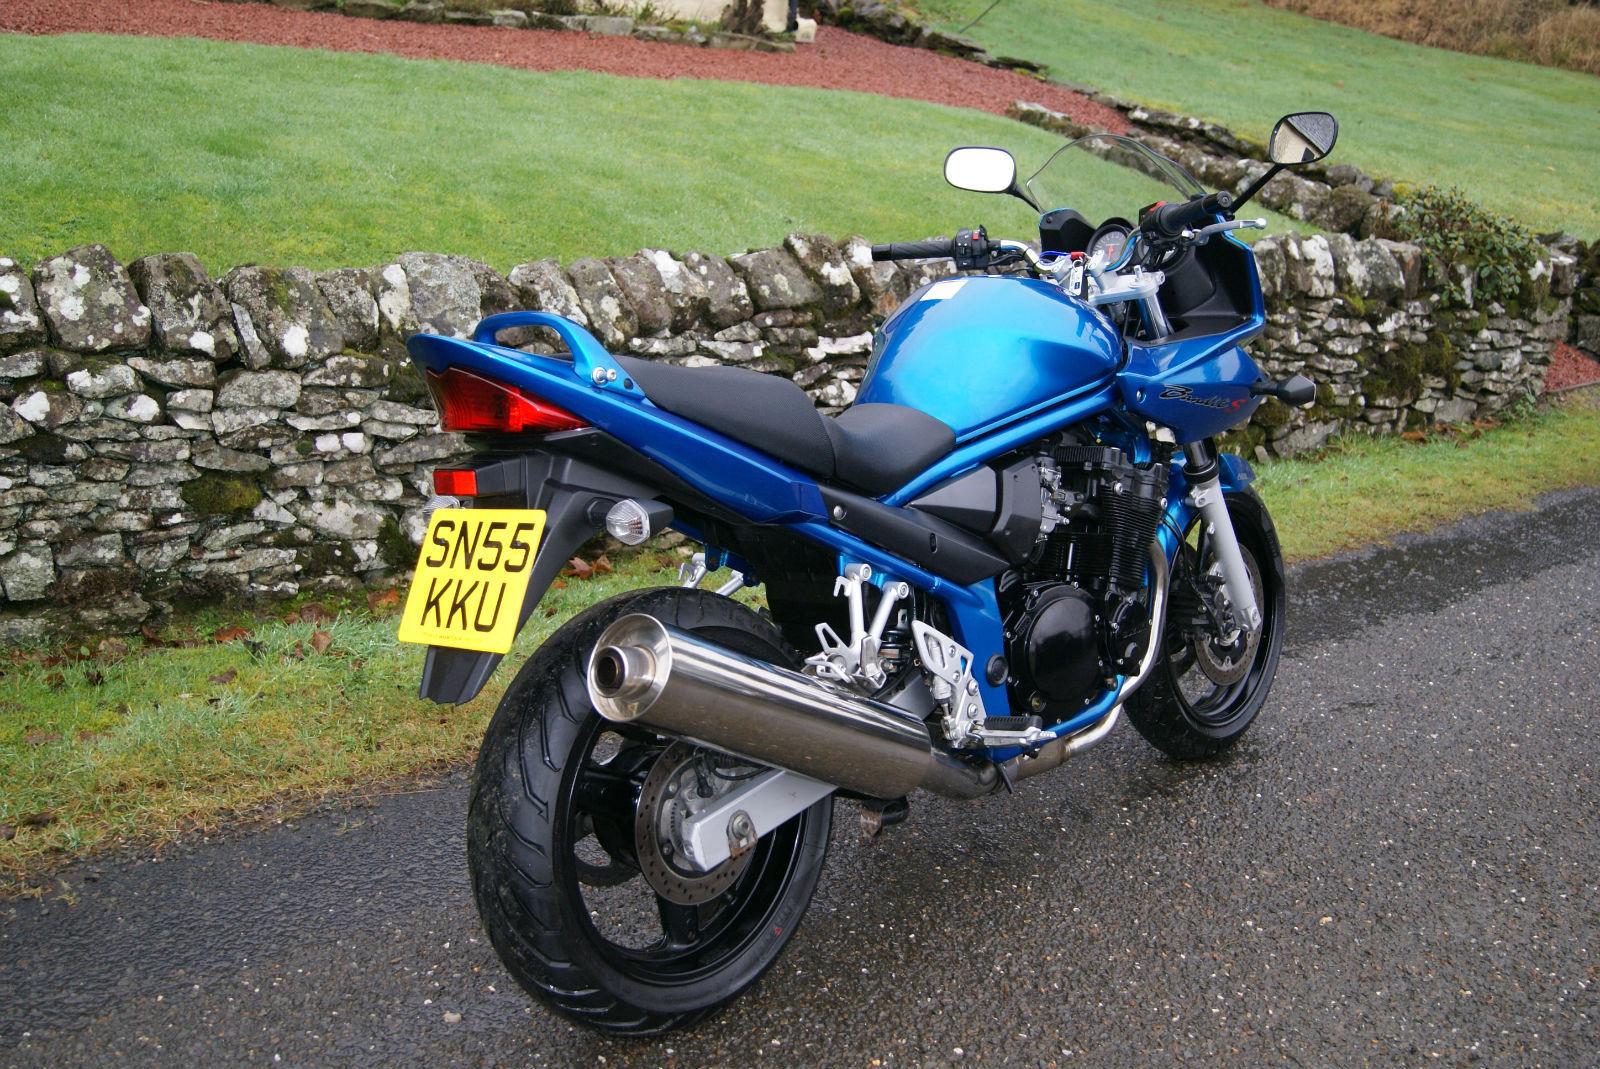 Тест-драйв мотоцикла Suzuki GSF 650 Bandit